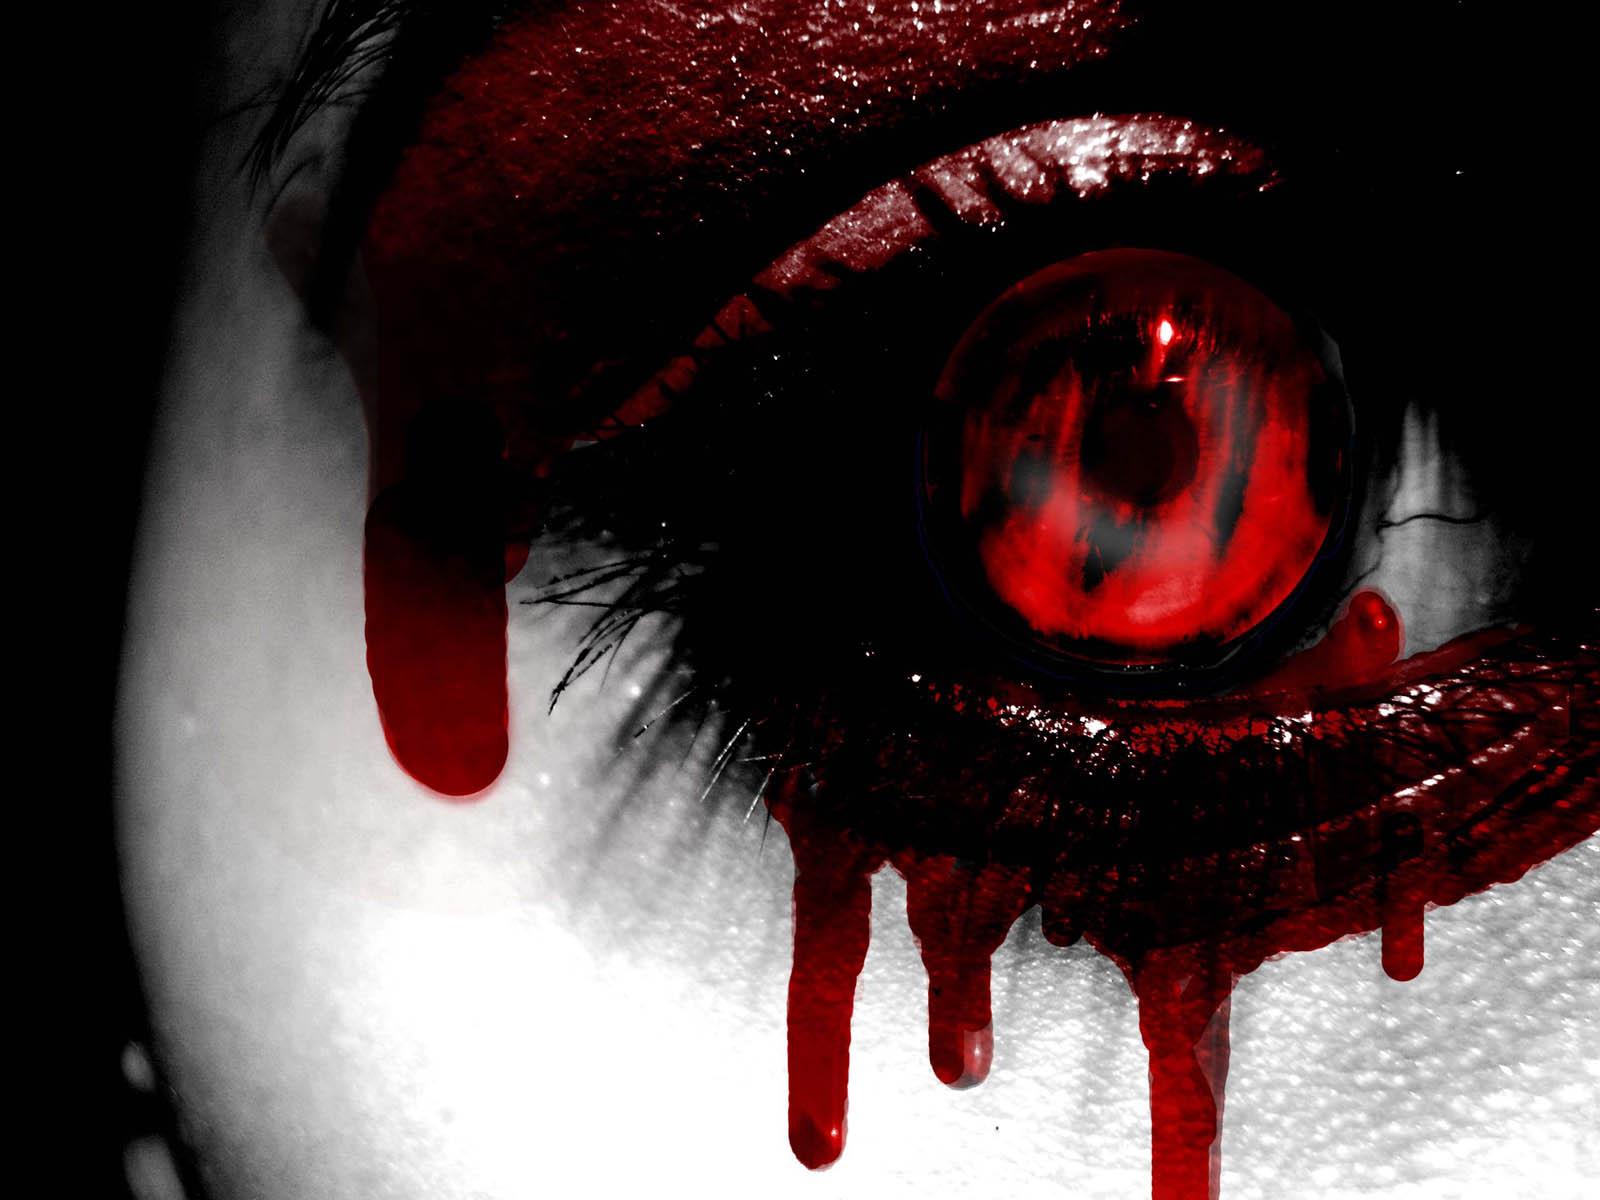 horror eye wallpapers horror eye desktop wallpapers horror eye desktop 1600x1200